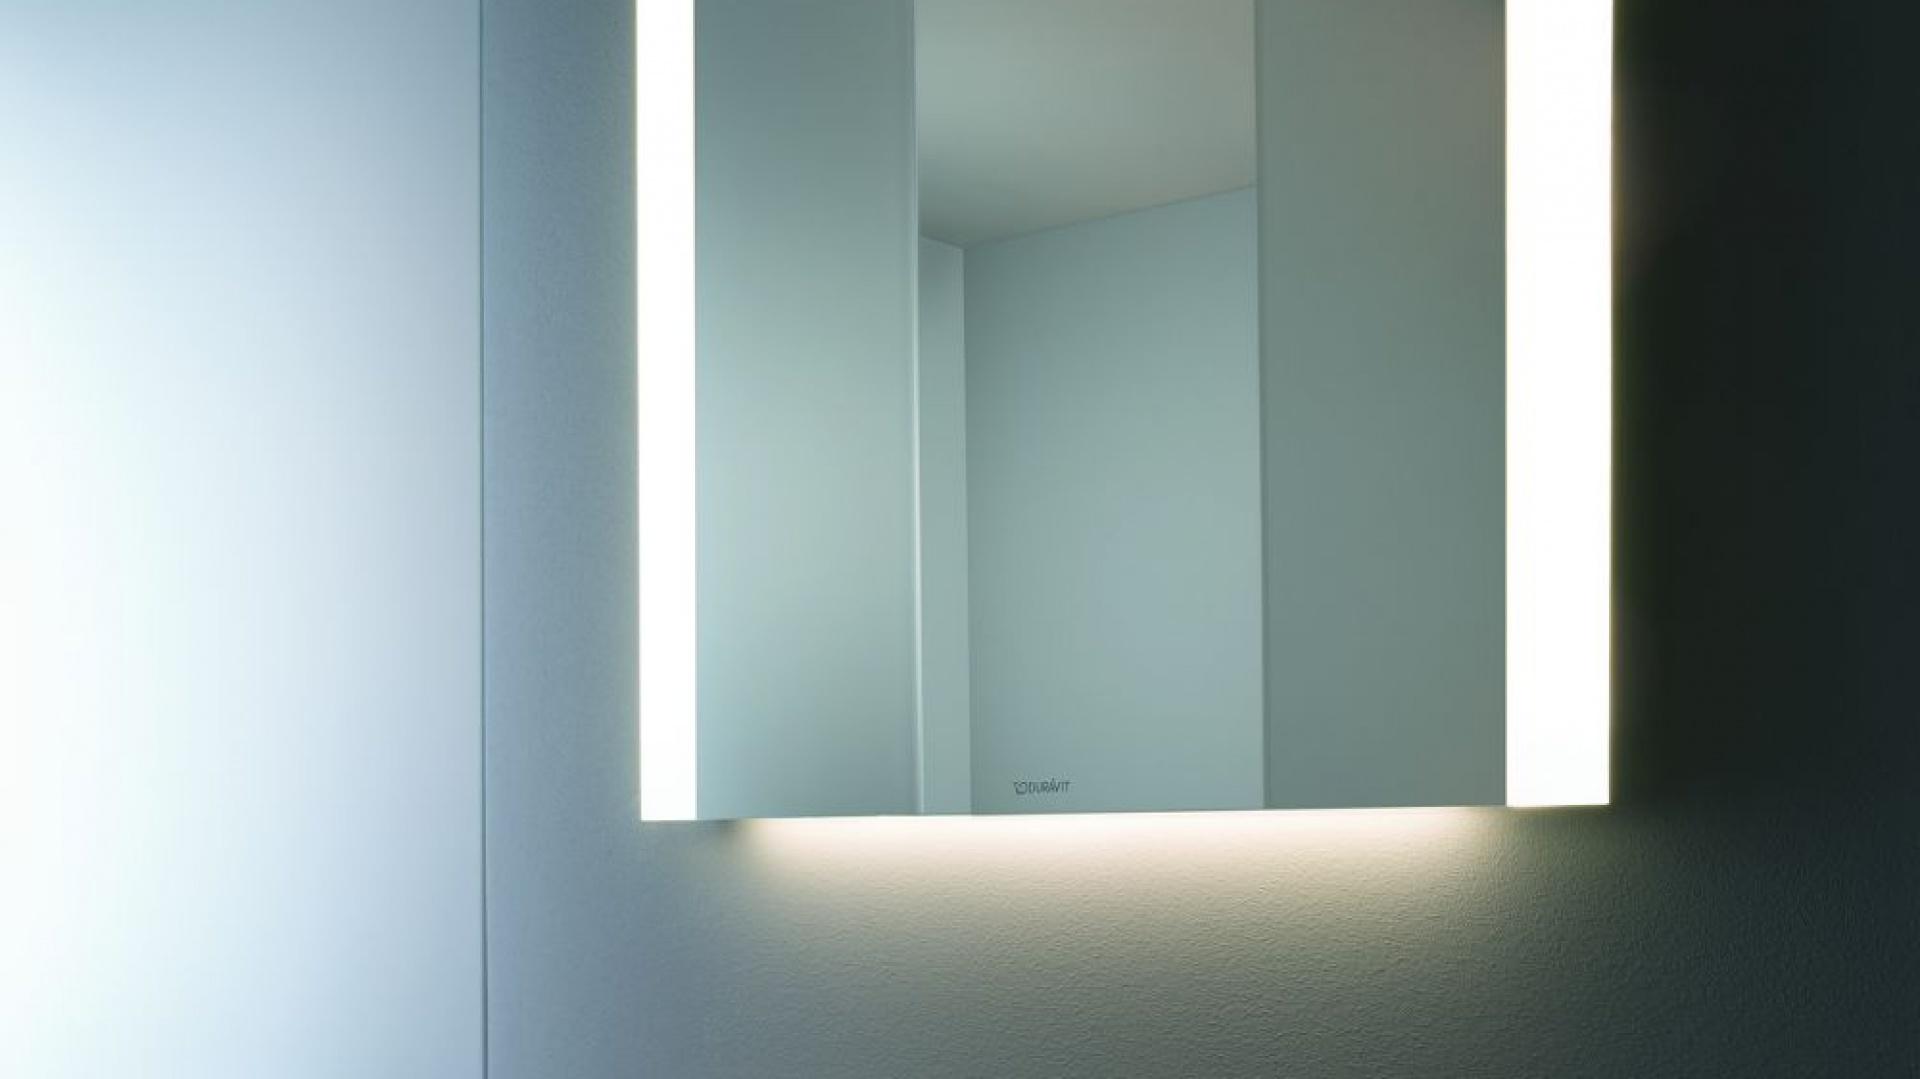 Lustra zintegrowane z oświetleniem. Fot. Duravit